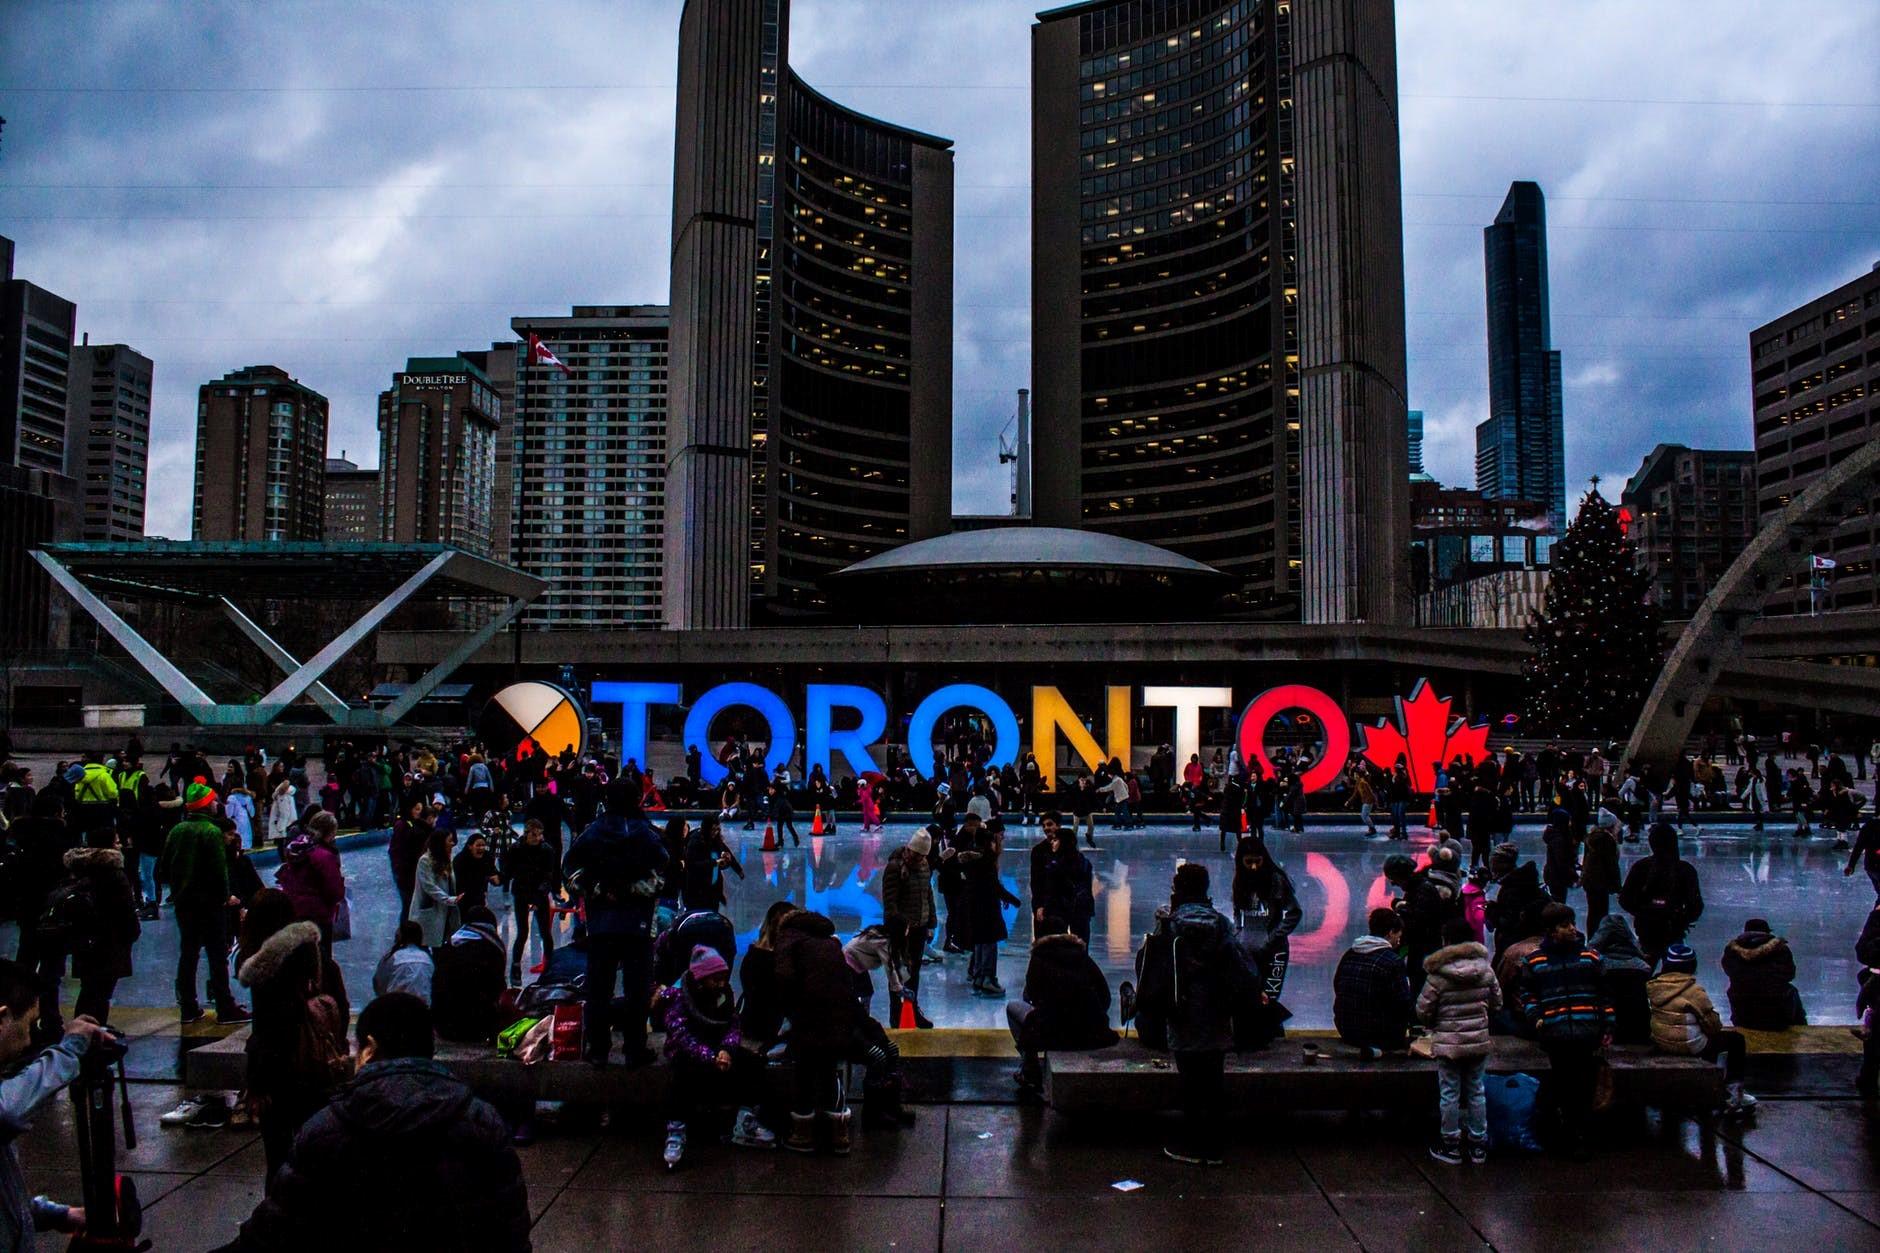 How Art Became an Integral Part of Toronto's Landscape